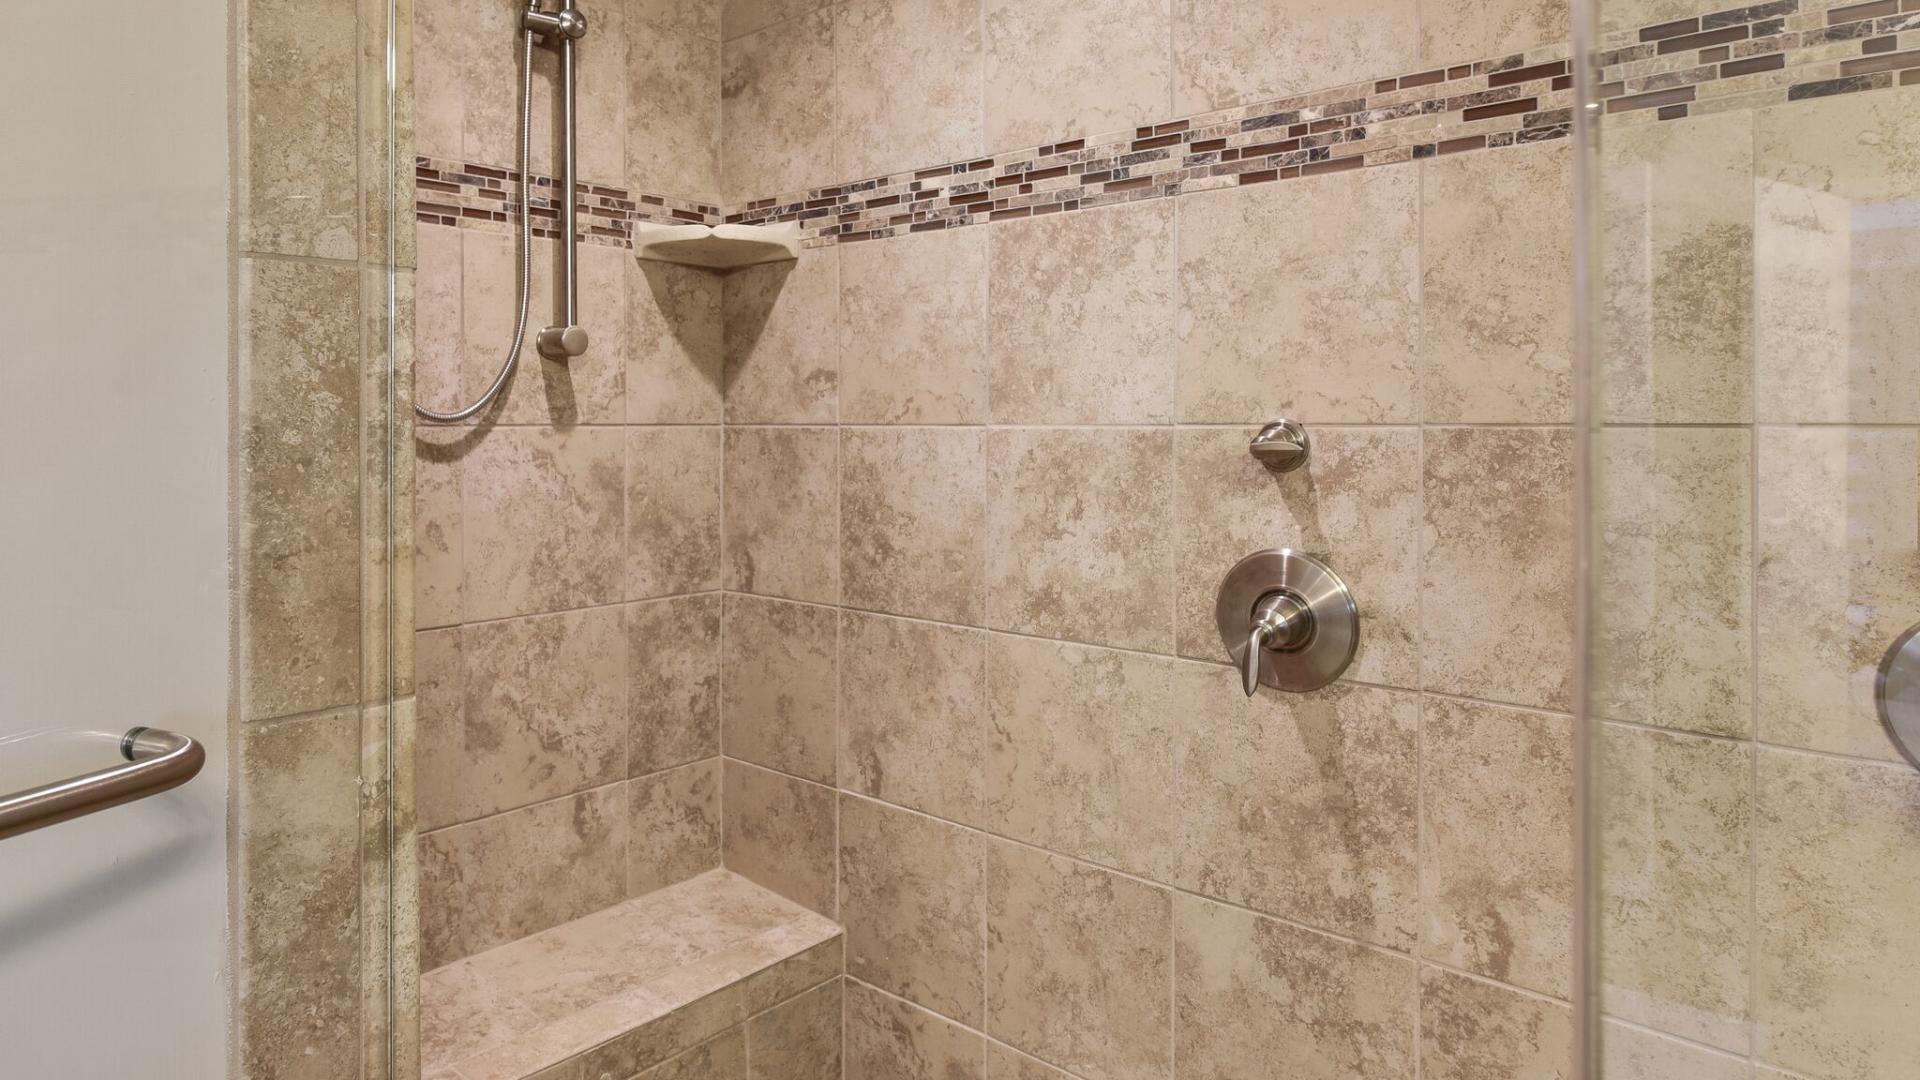 Bathroom featured in the Birmingham By Maronda Homes in Cincinnati, OH